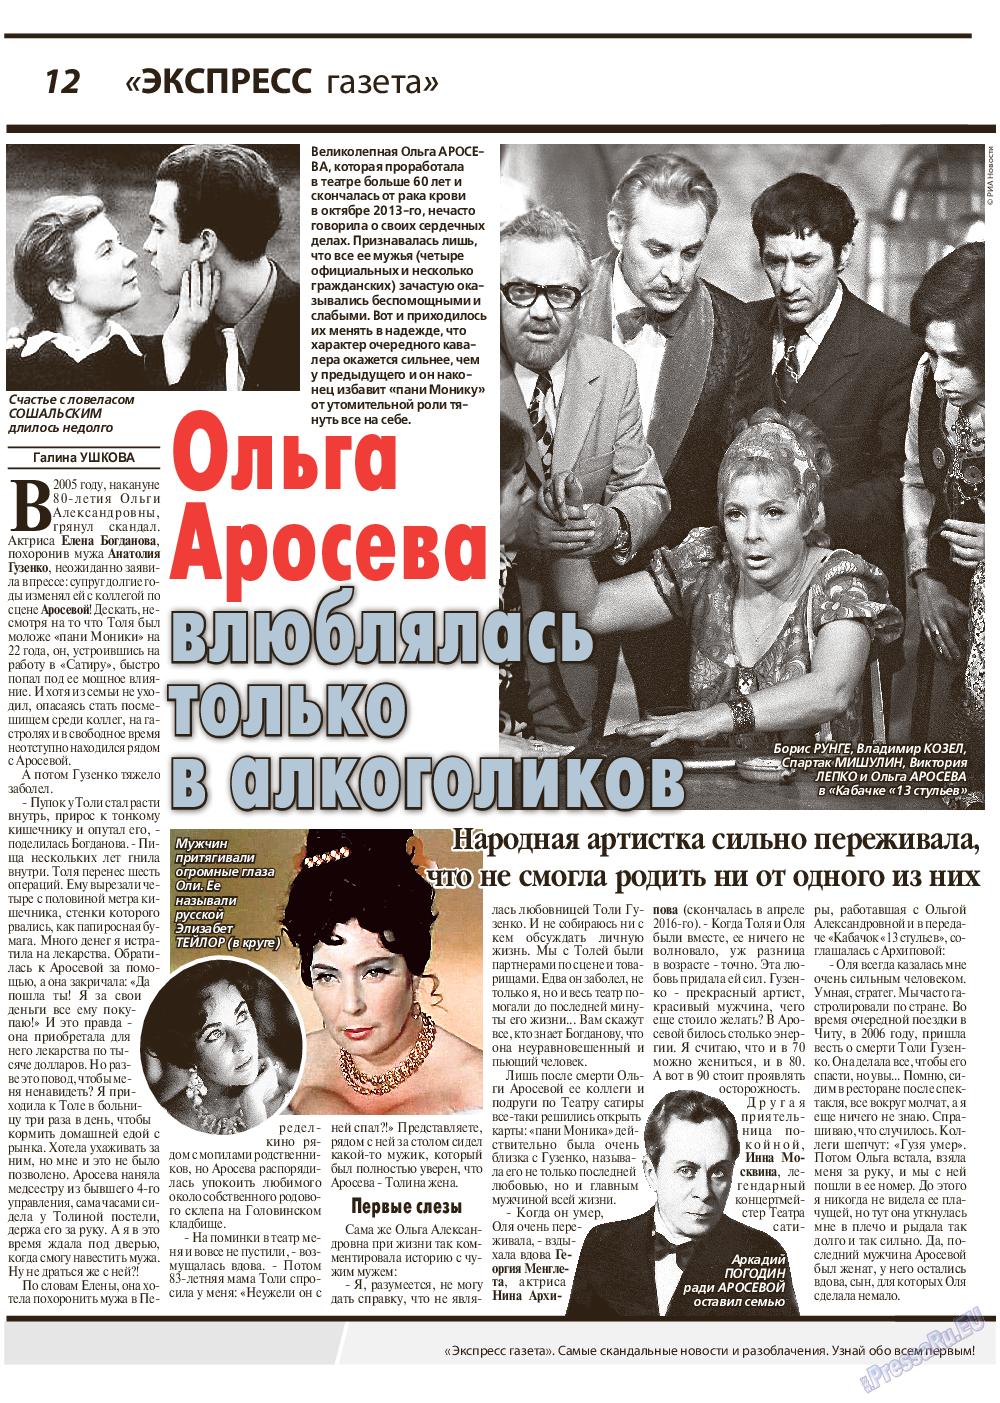 Экспресс газета (газета). 2019 год, номер 9, стр. 12